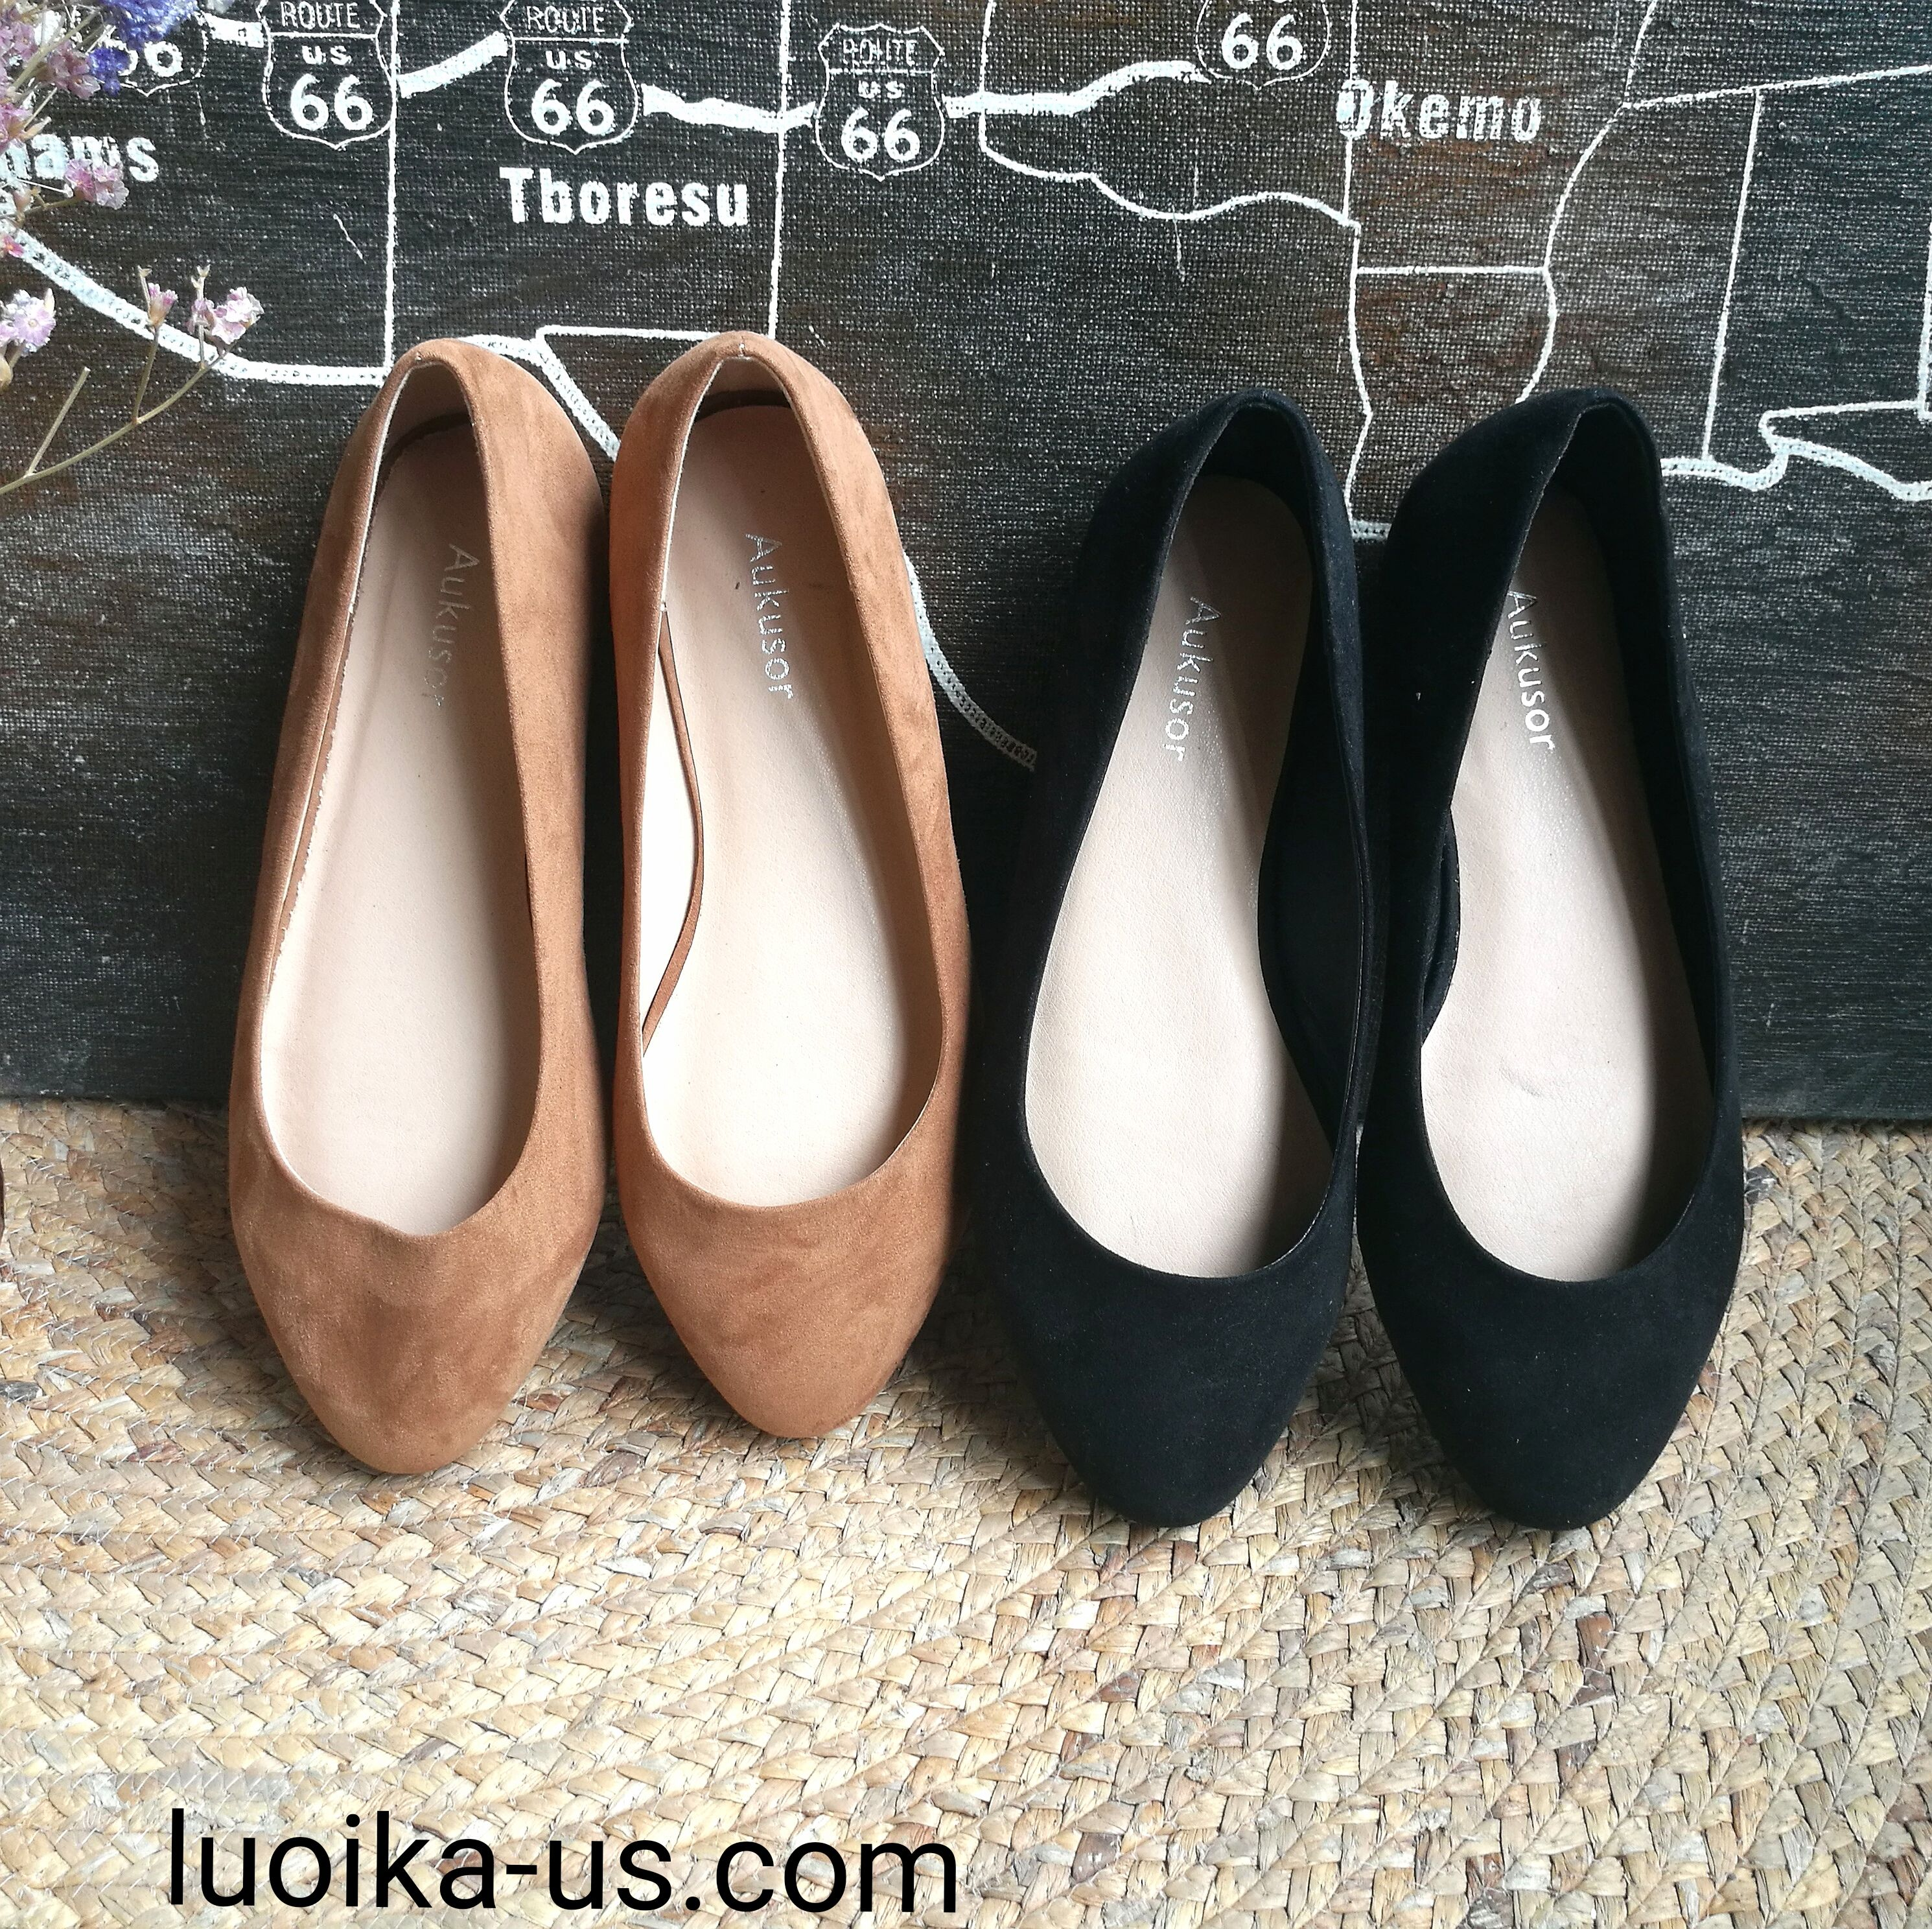 Aukusor Womens Wide Width Ballet Flat Cozy Round Toe Slip On Flat Shoes.